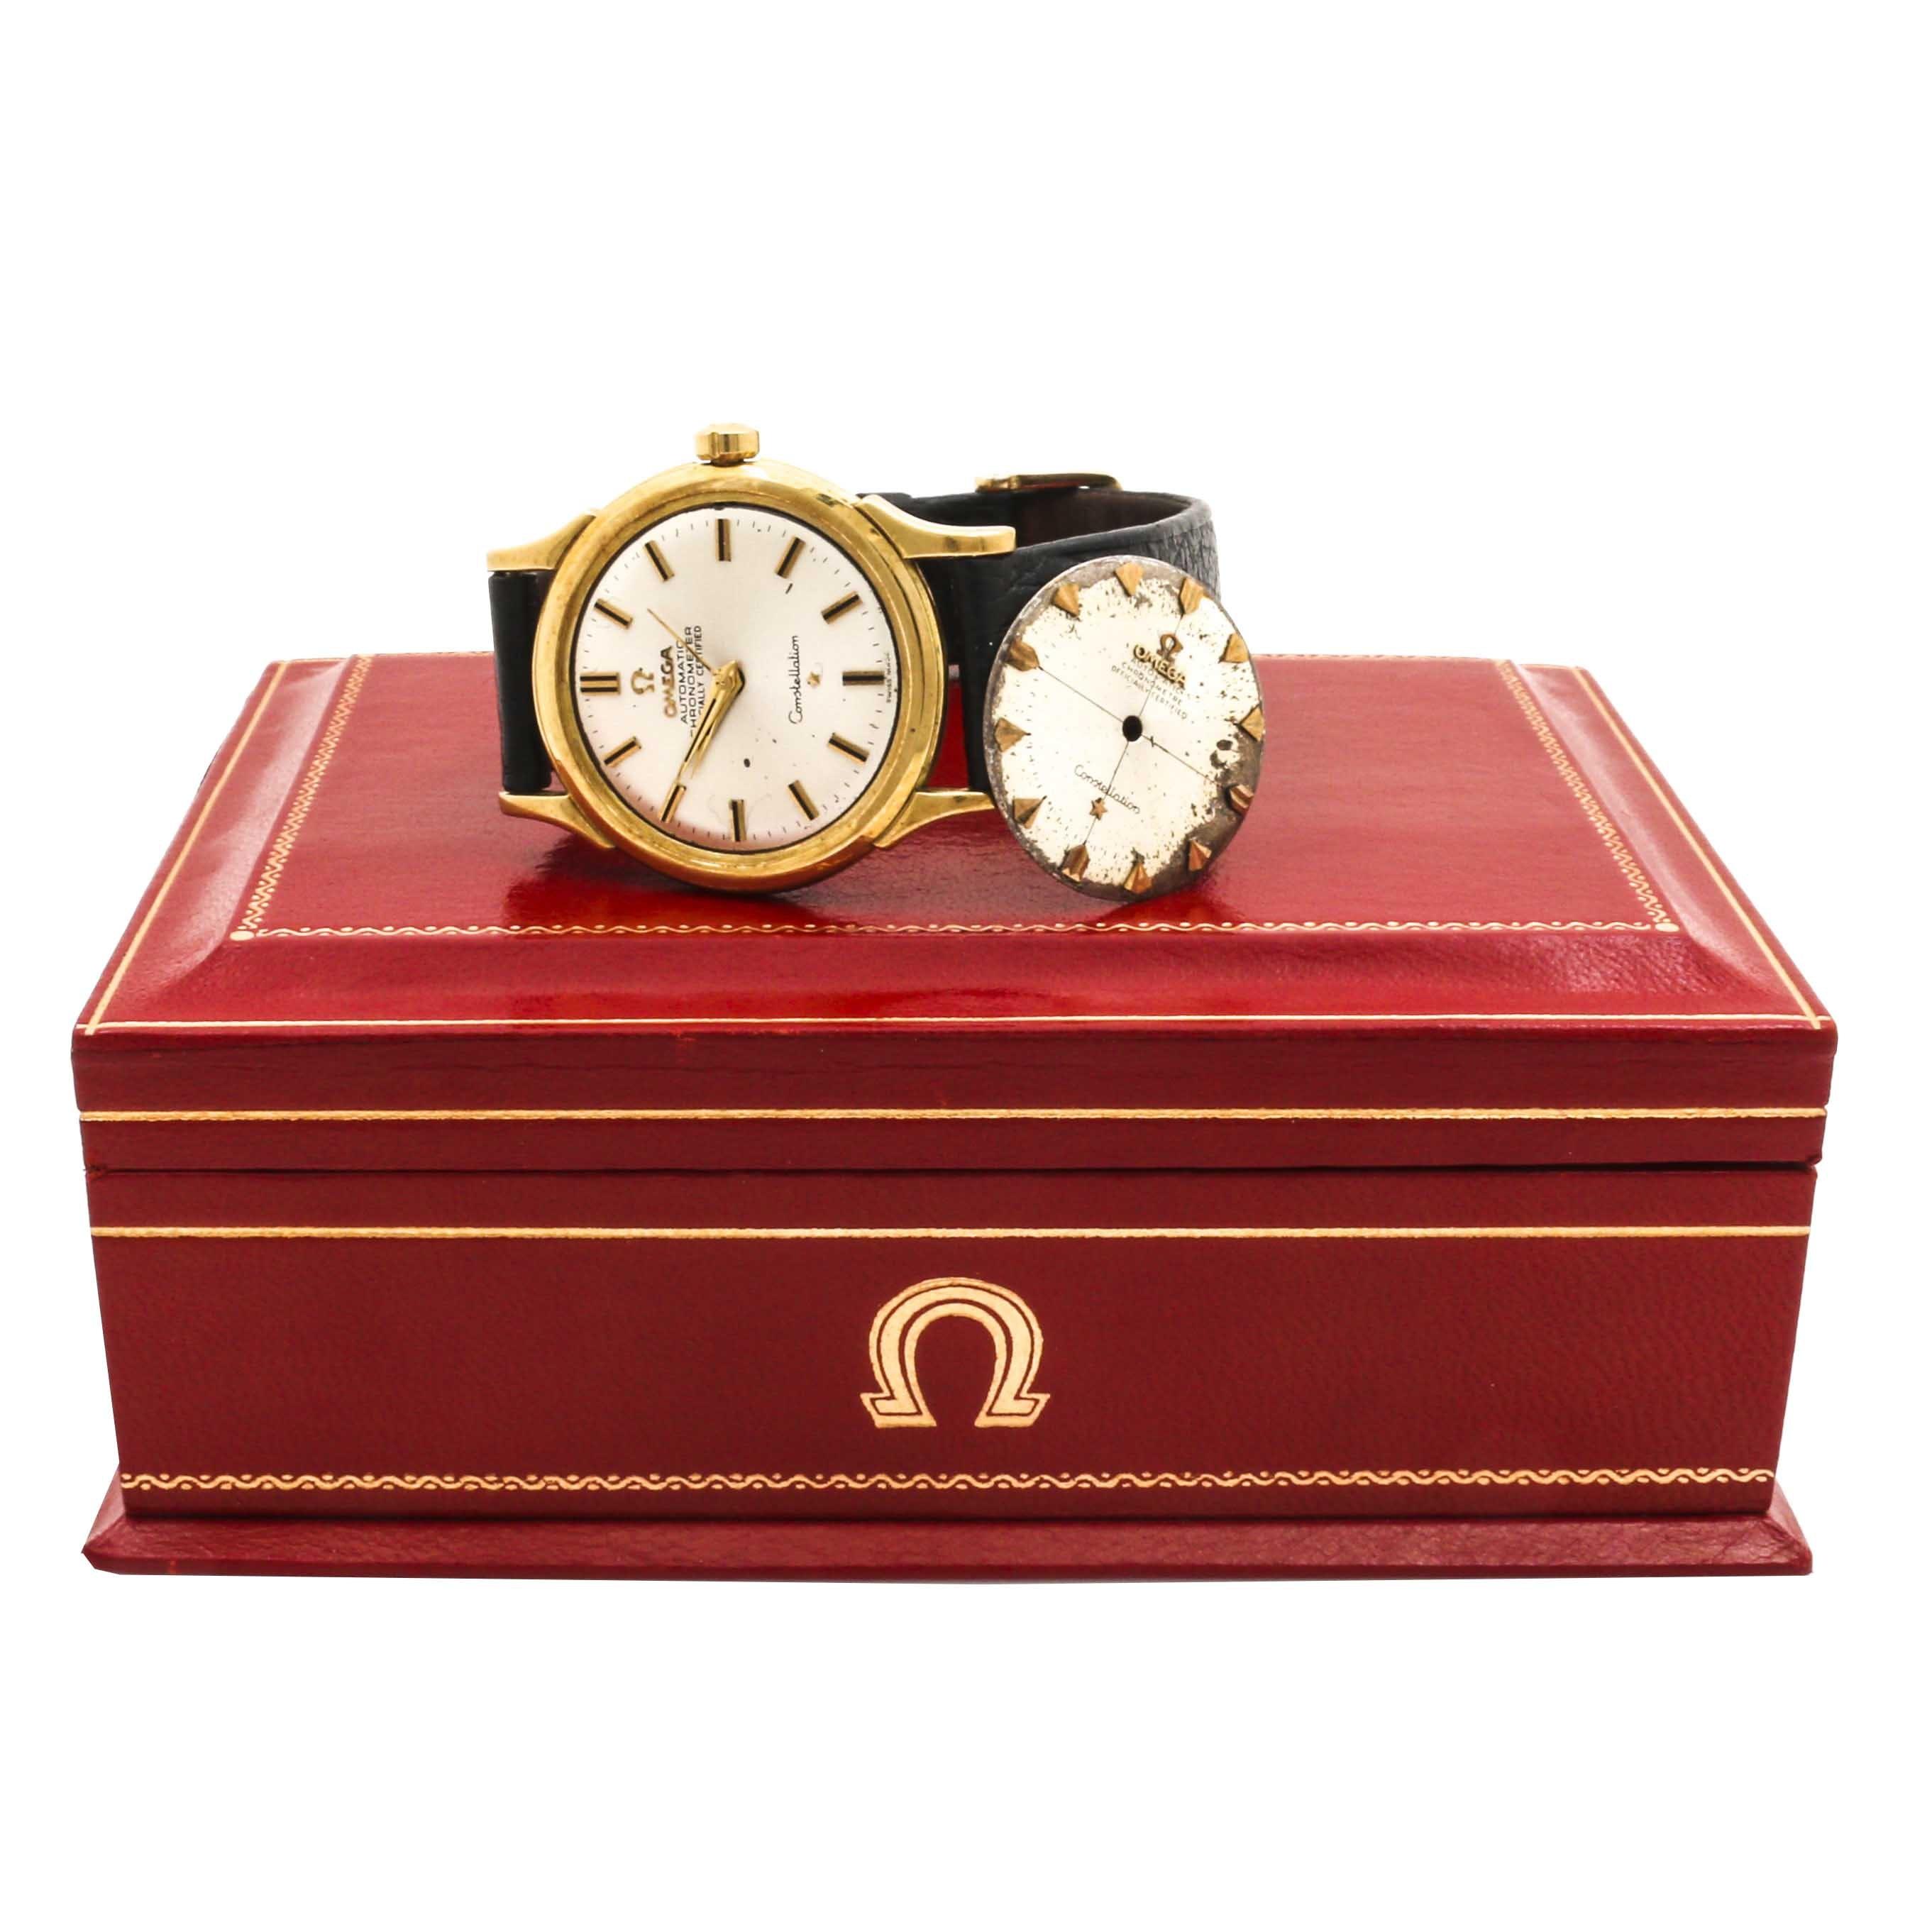 Omega 18K Yellow Gold Constellation Automatic Chronometer Wristwatch